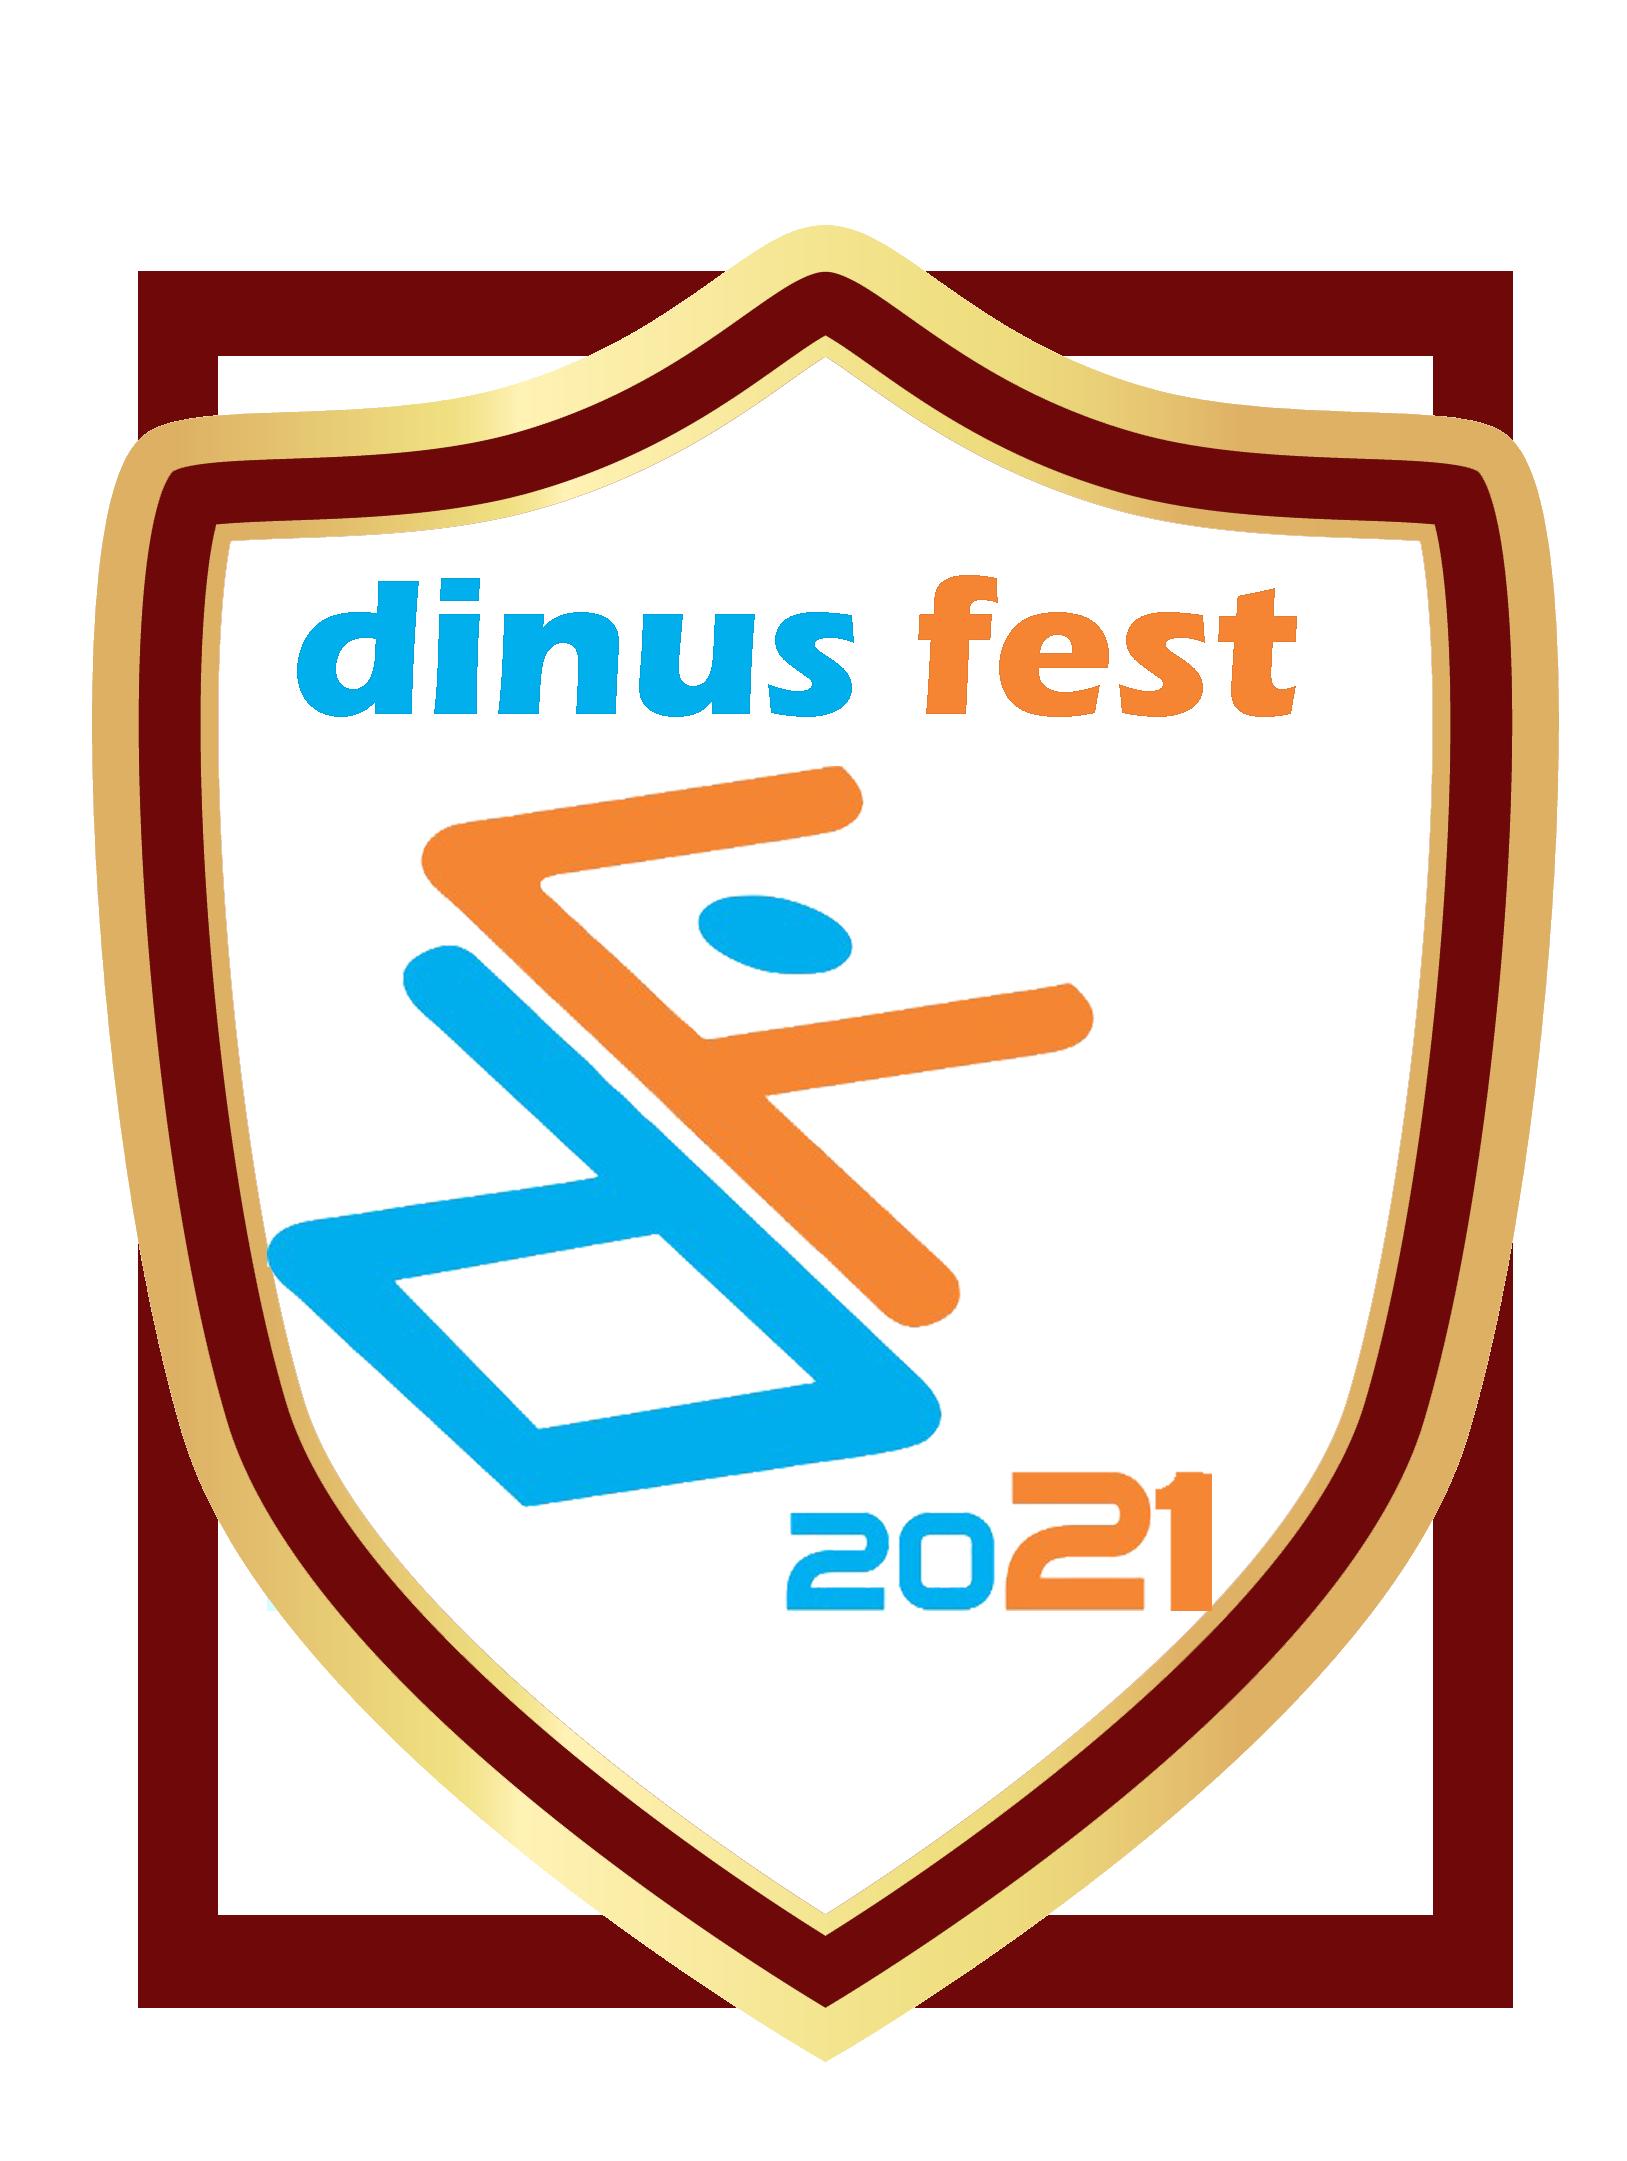 EVENTS SEMARANG : DINUSFEST 2021